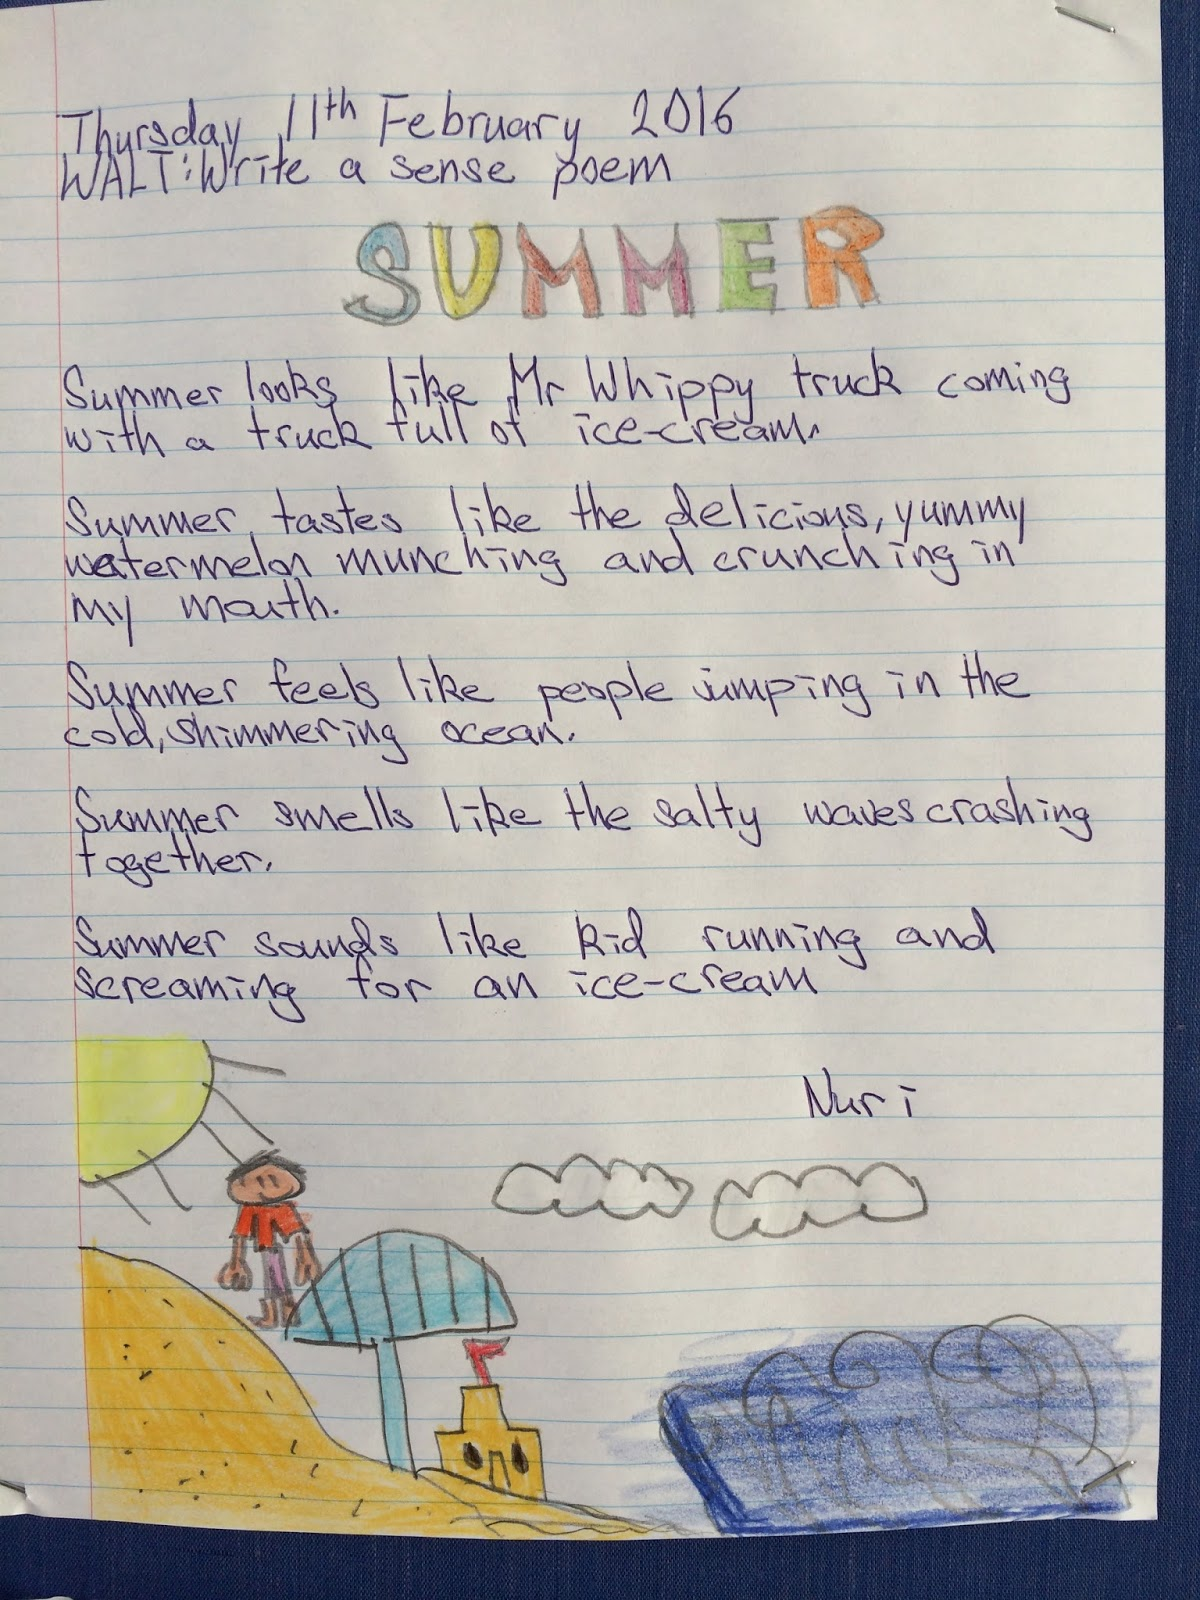 Summer Poems For School